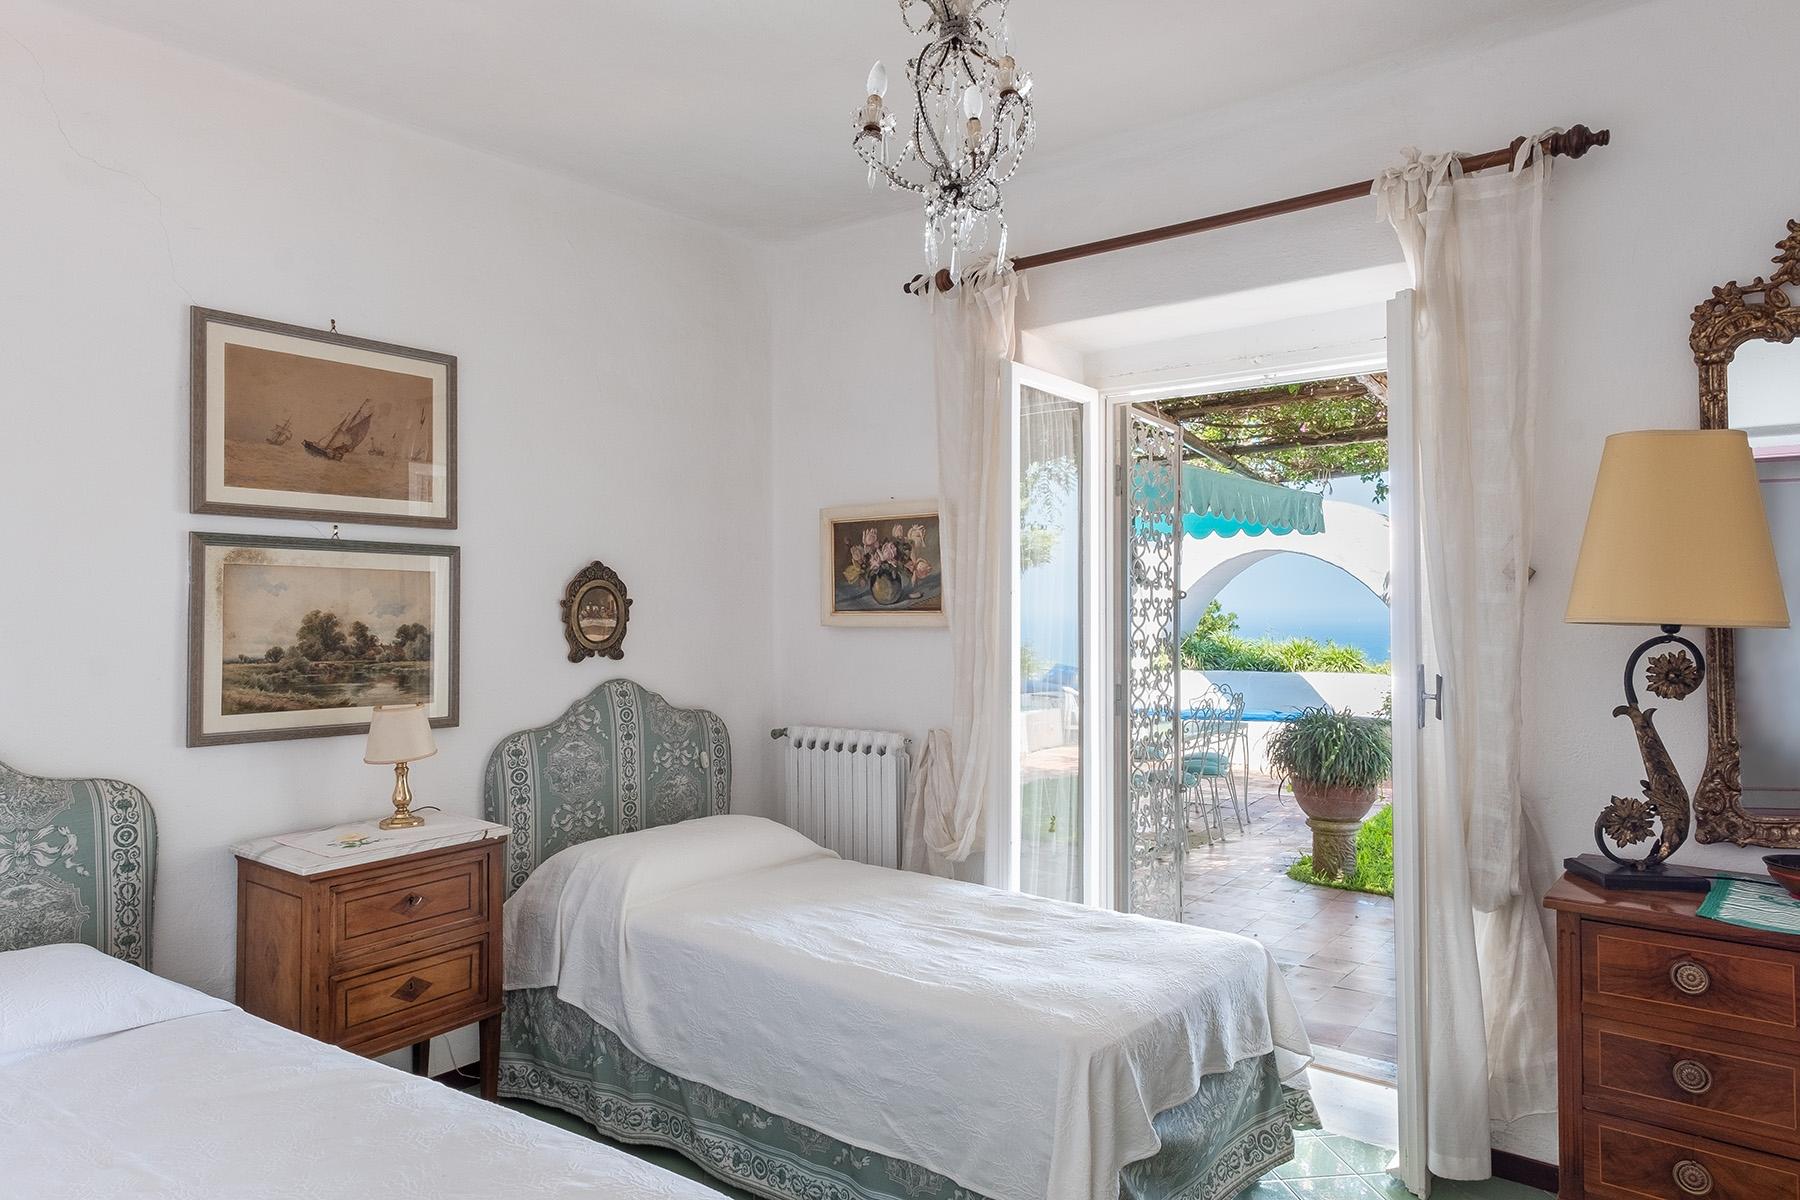 Villa in Vendita a Ischia: 5 locali, 206 mq - Foto 10